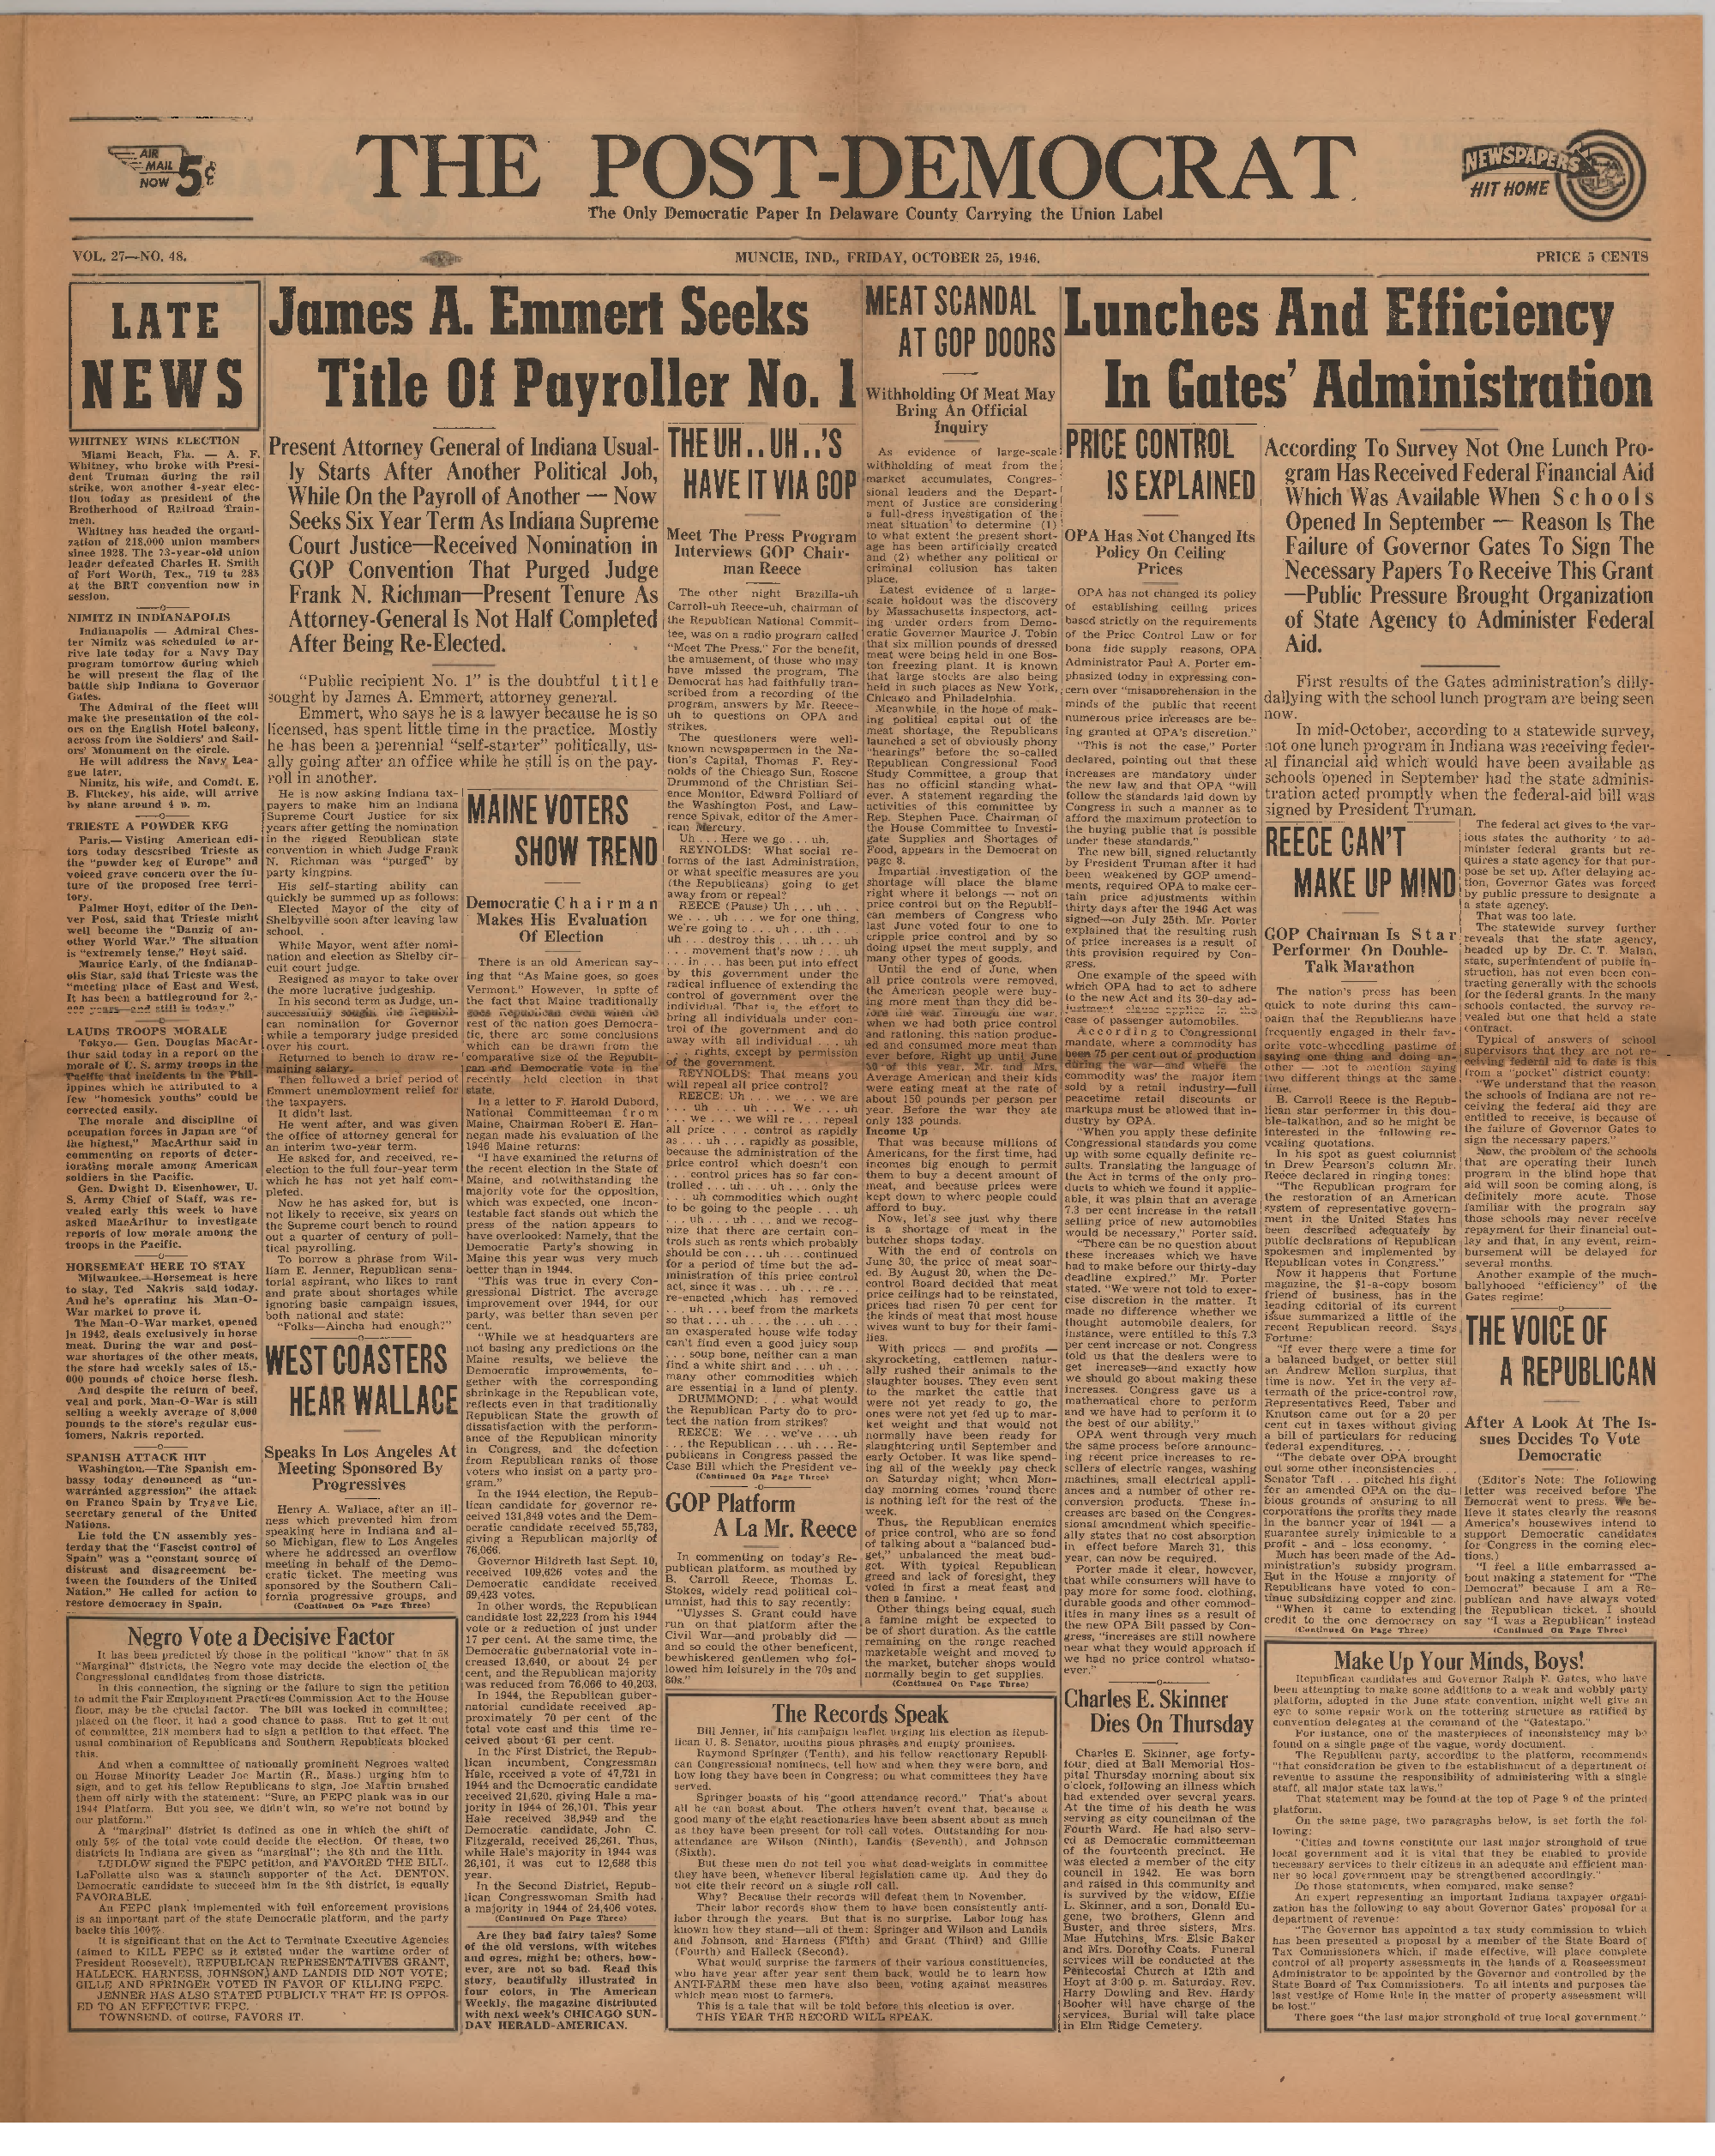 Post Democrat (Muncie, Ind.) 1946 10 25, Vol. 27, No. 48 Inside 20When Does Dorchester County School Start In August Of 20